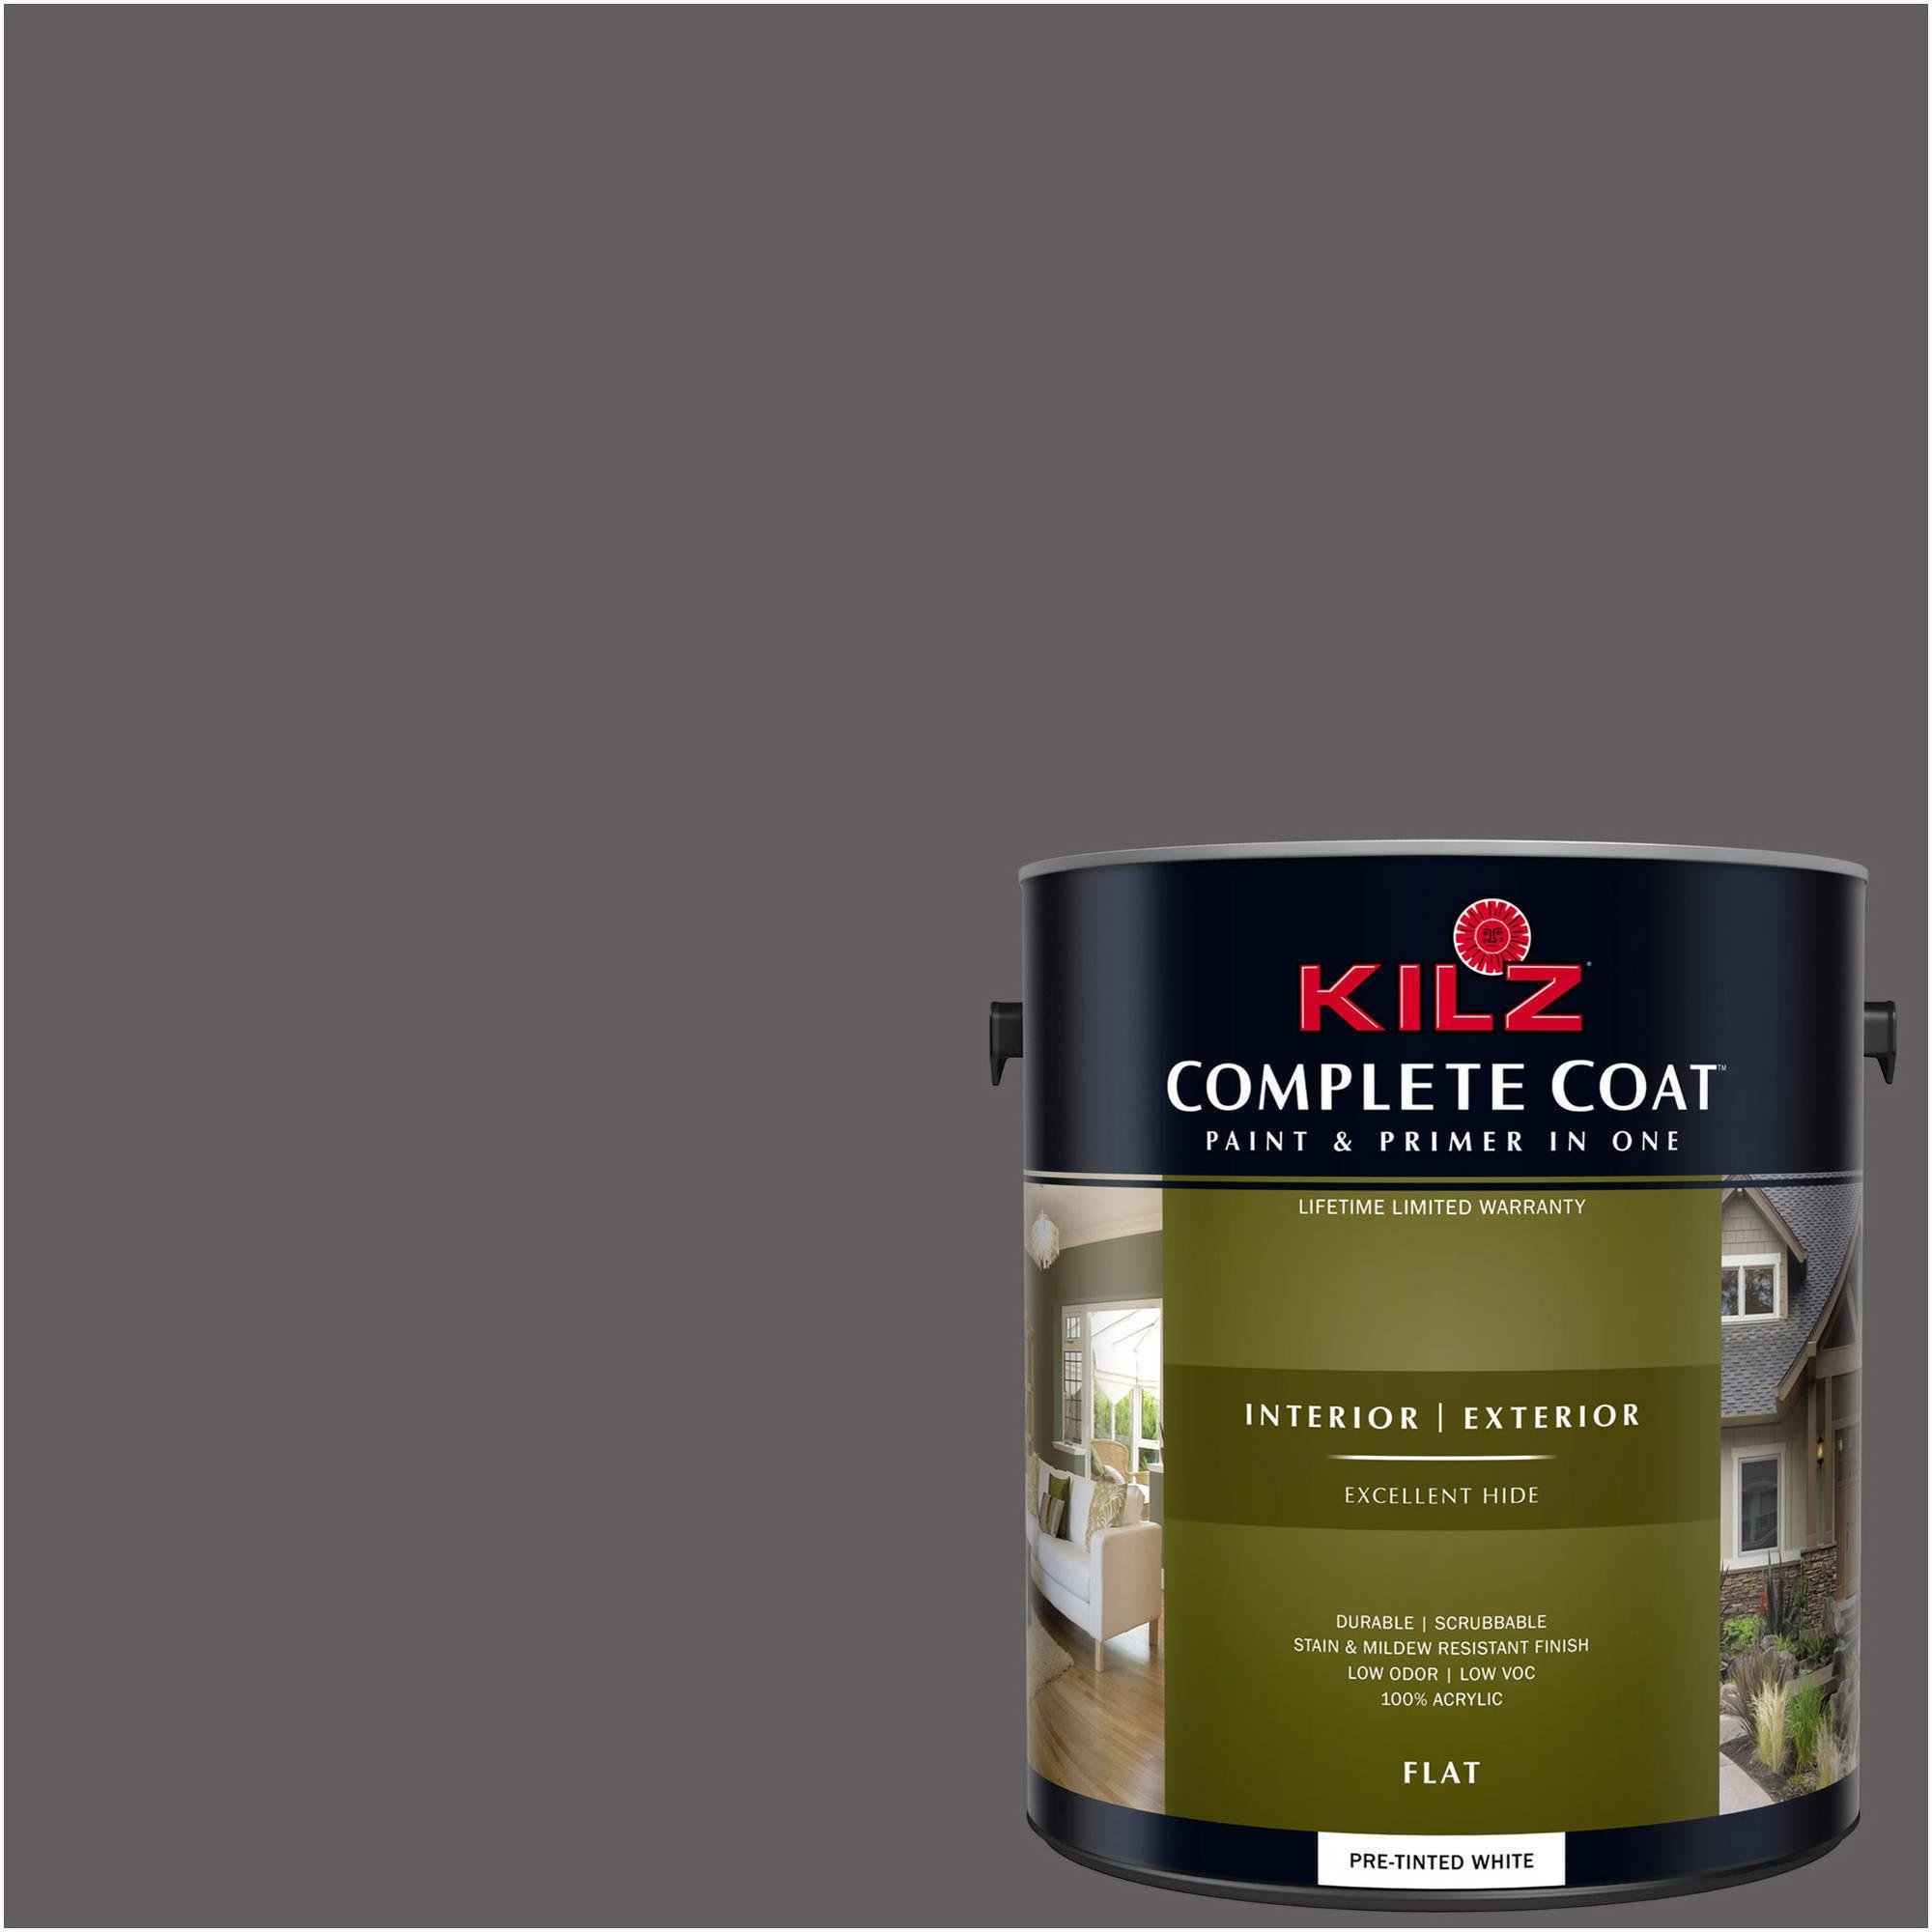 KILZ COMPLETE COAT Interior/Exterior Paint & Primer in One #RM200 Space